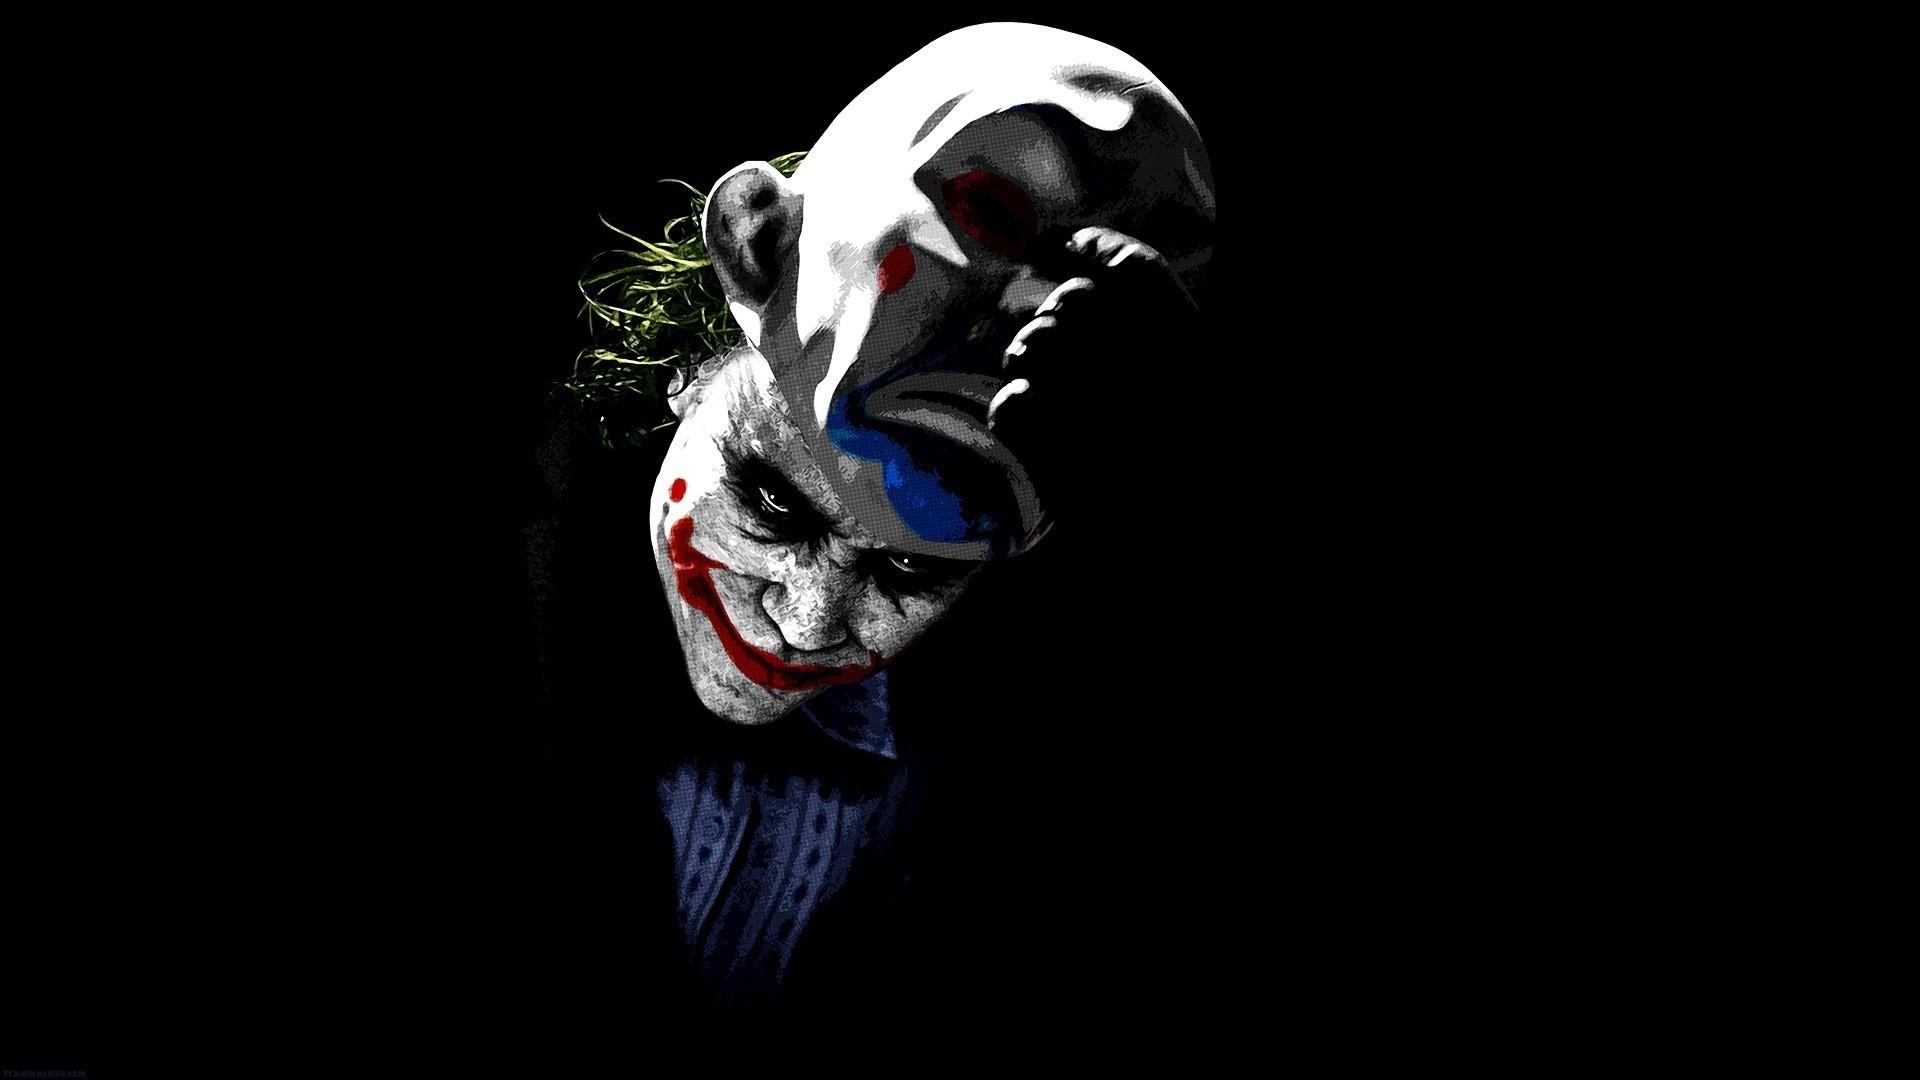 1920x1080 Joker Batman The Dark Knight Wallpapers HD Desktop And Mobile Backgrounds